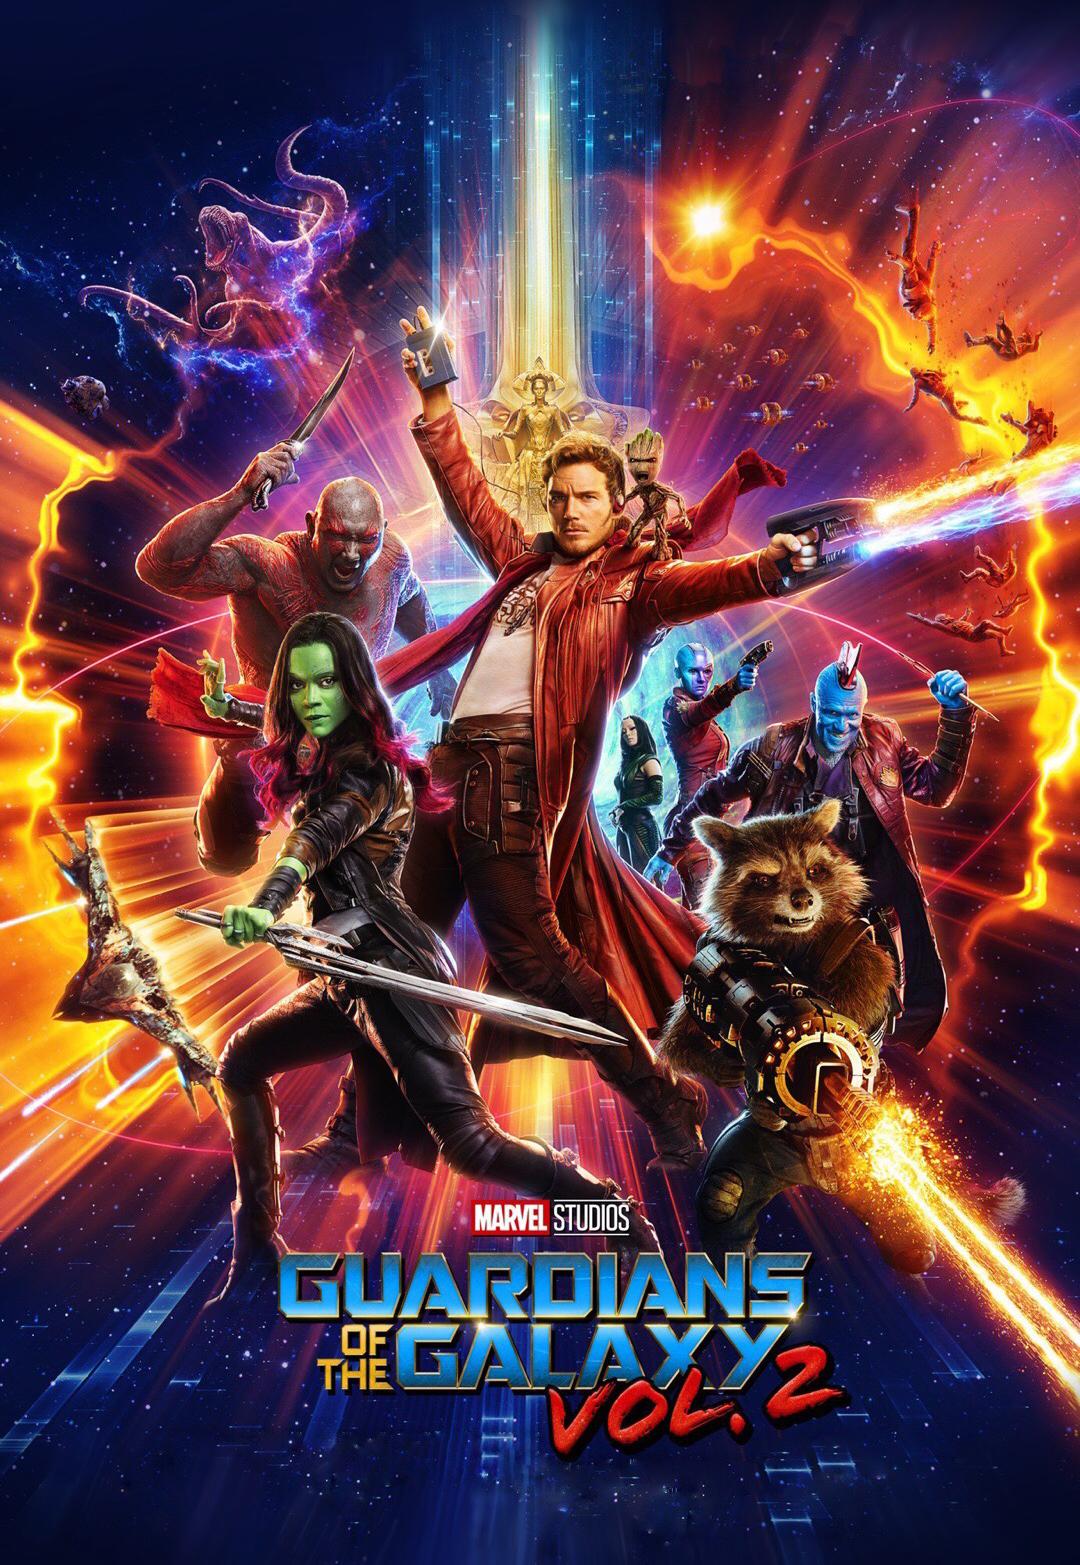 Guardians-of-the-Galaxy-Wallpaper-Vol-2-iPhone-1.jpg